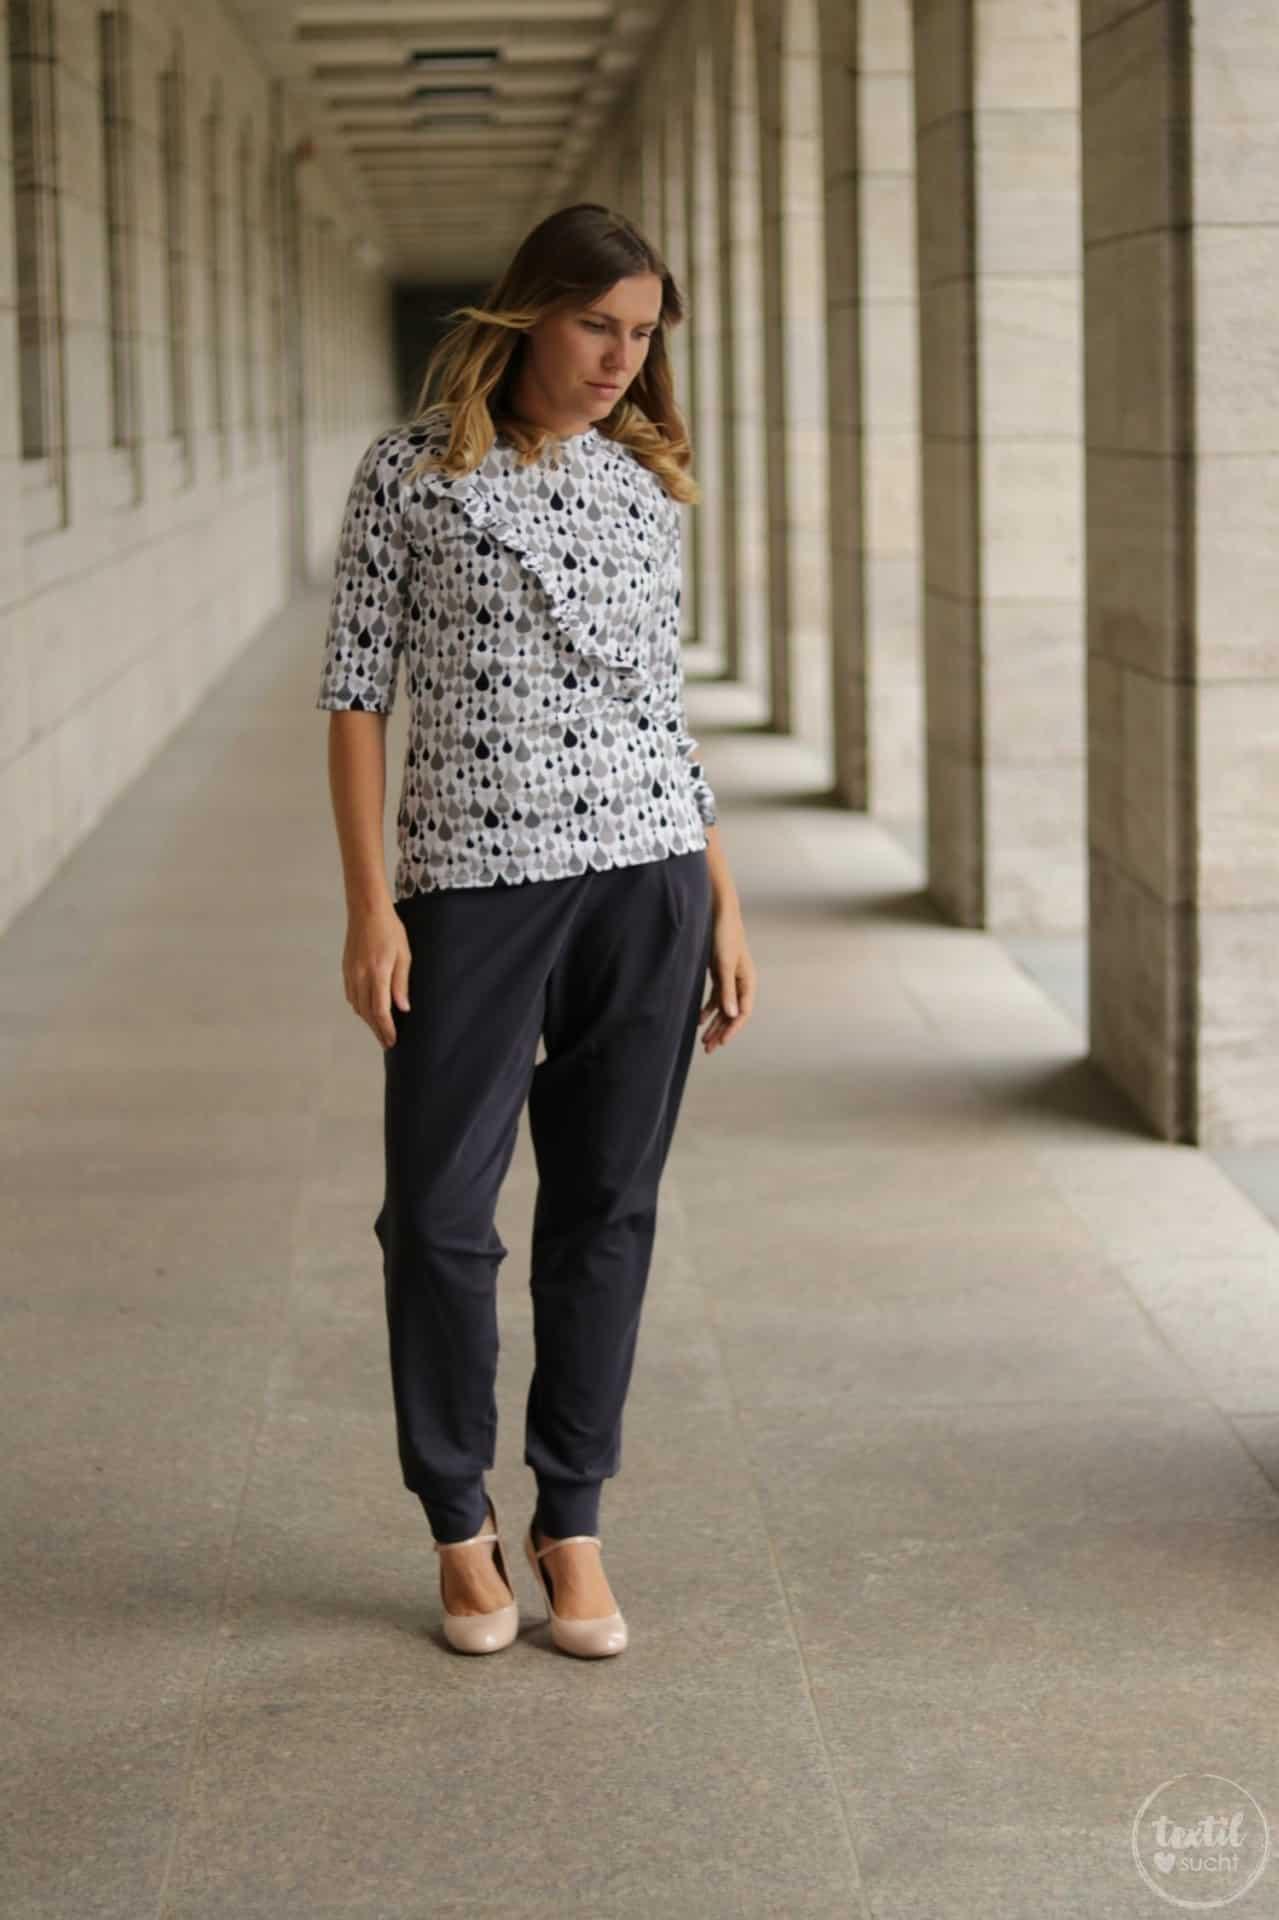 Schnittmuster kombinieren: Shirt Rüschli, Cardigan Lani und Hose Romana - Bild 5   textilsucht.de